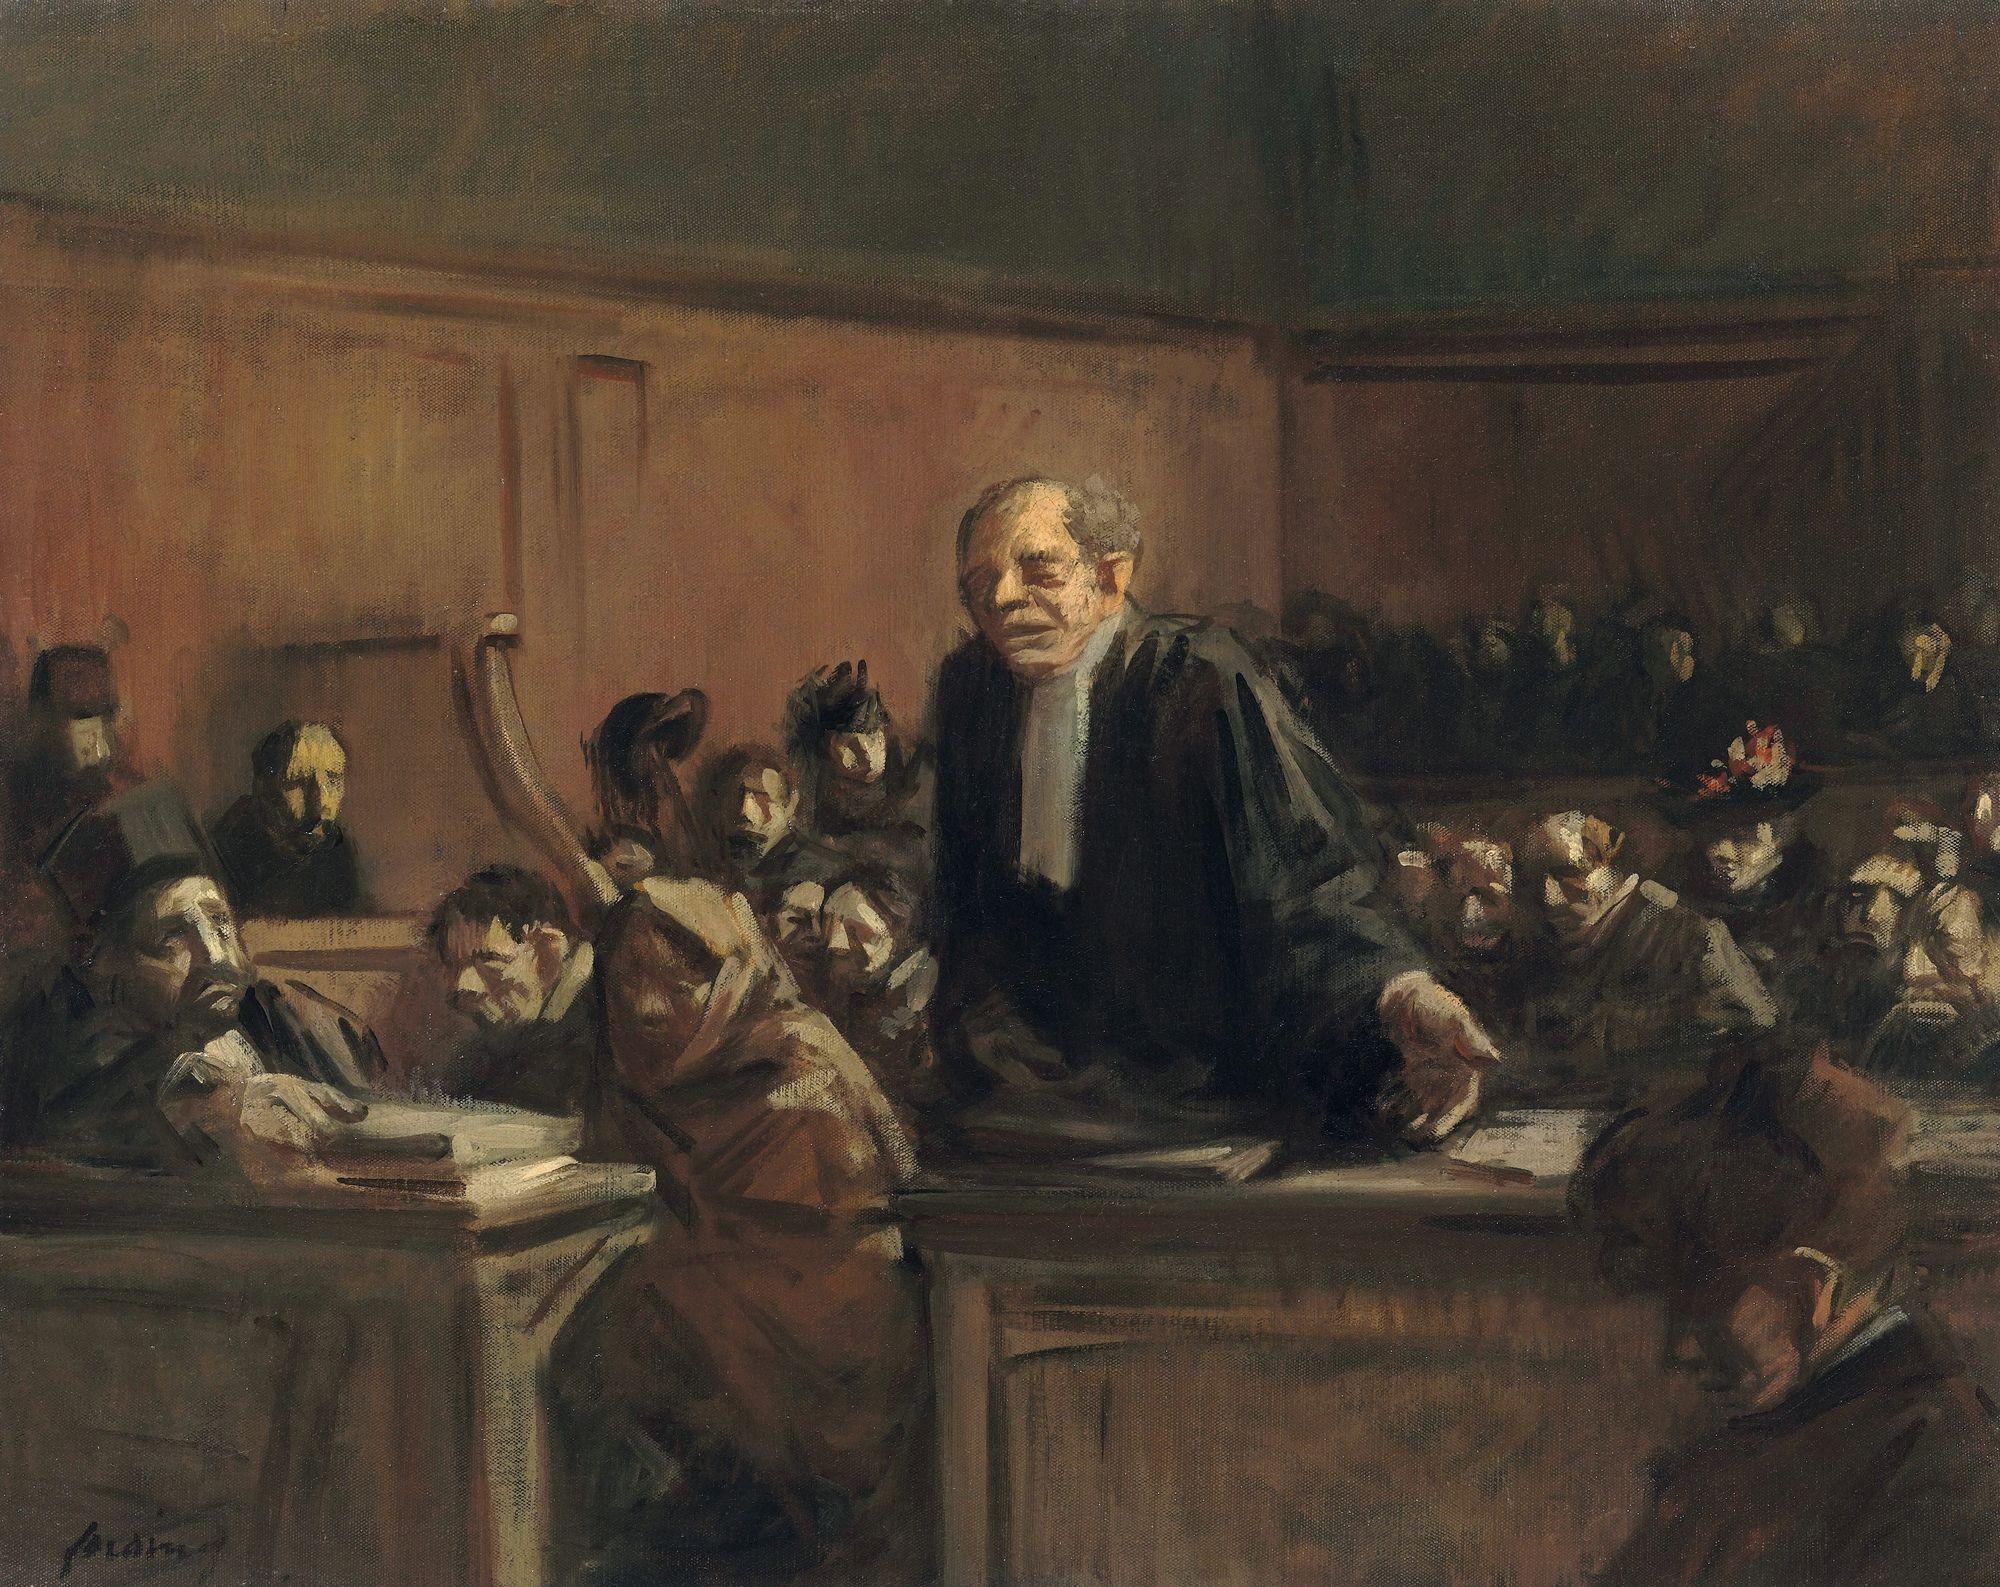 Jean-Louis Forain Scènes de tribunal